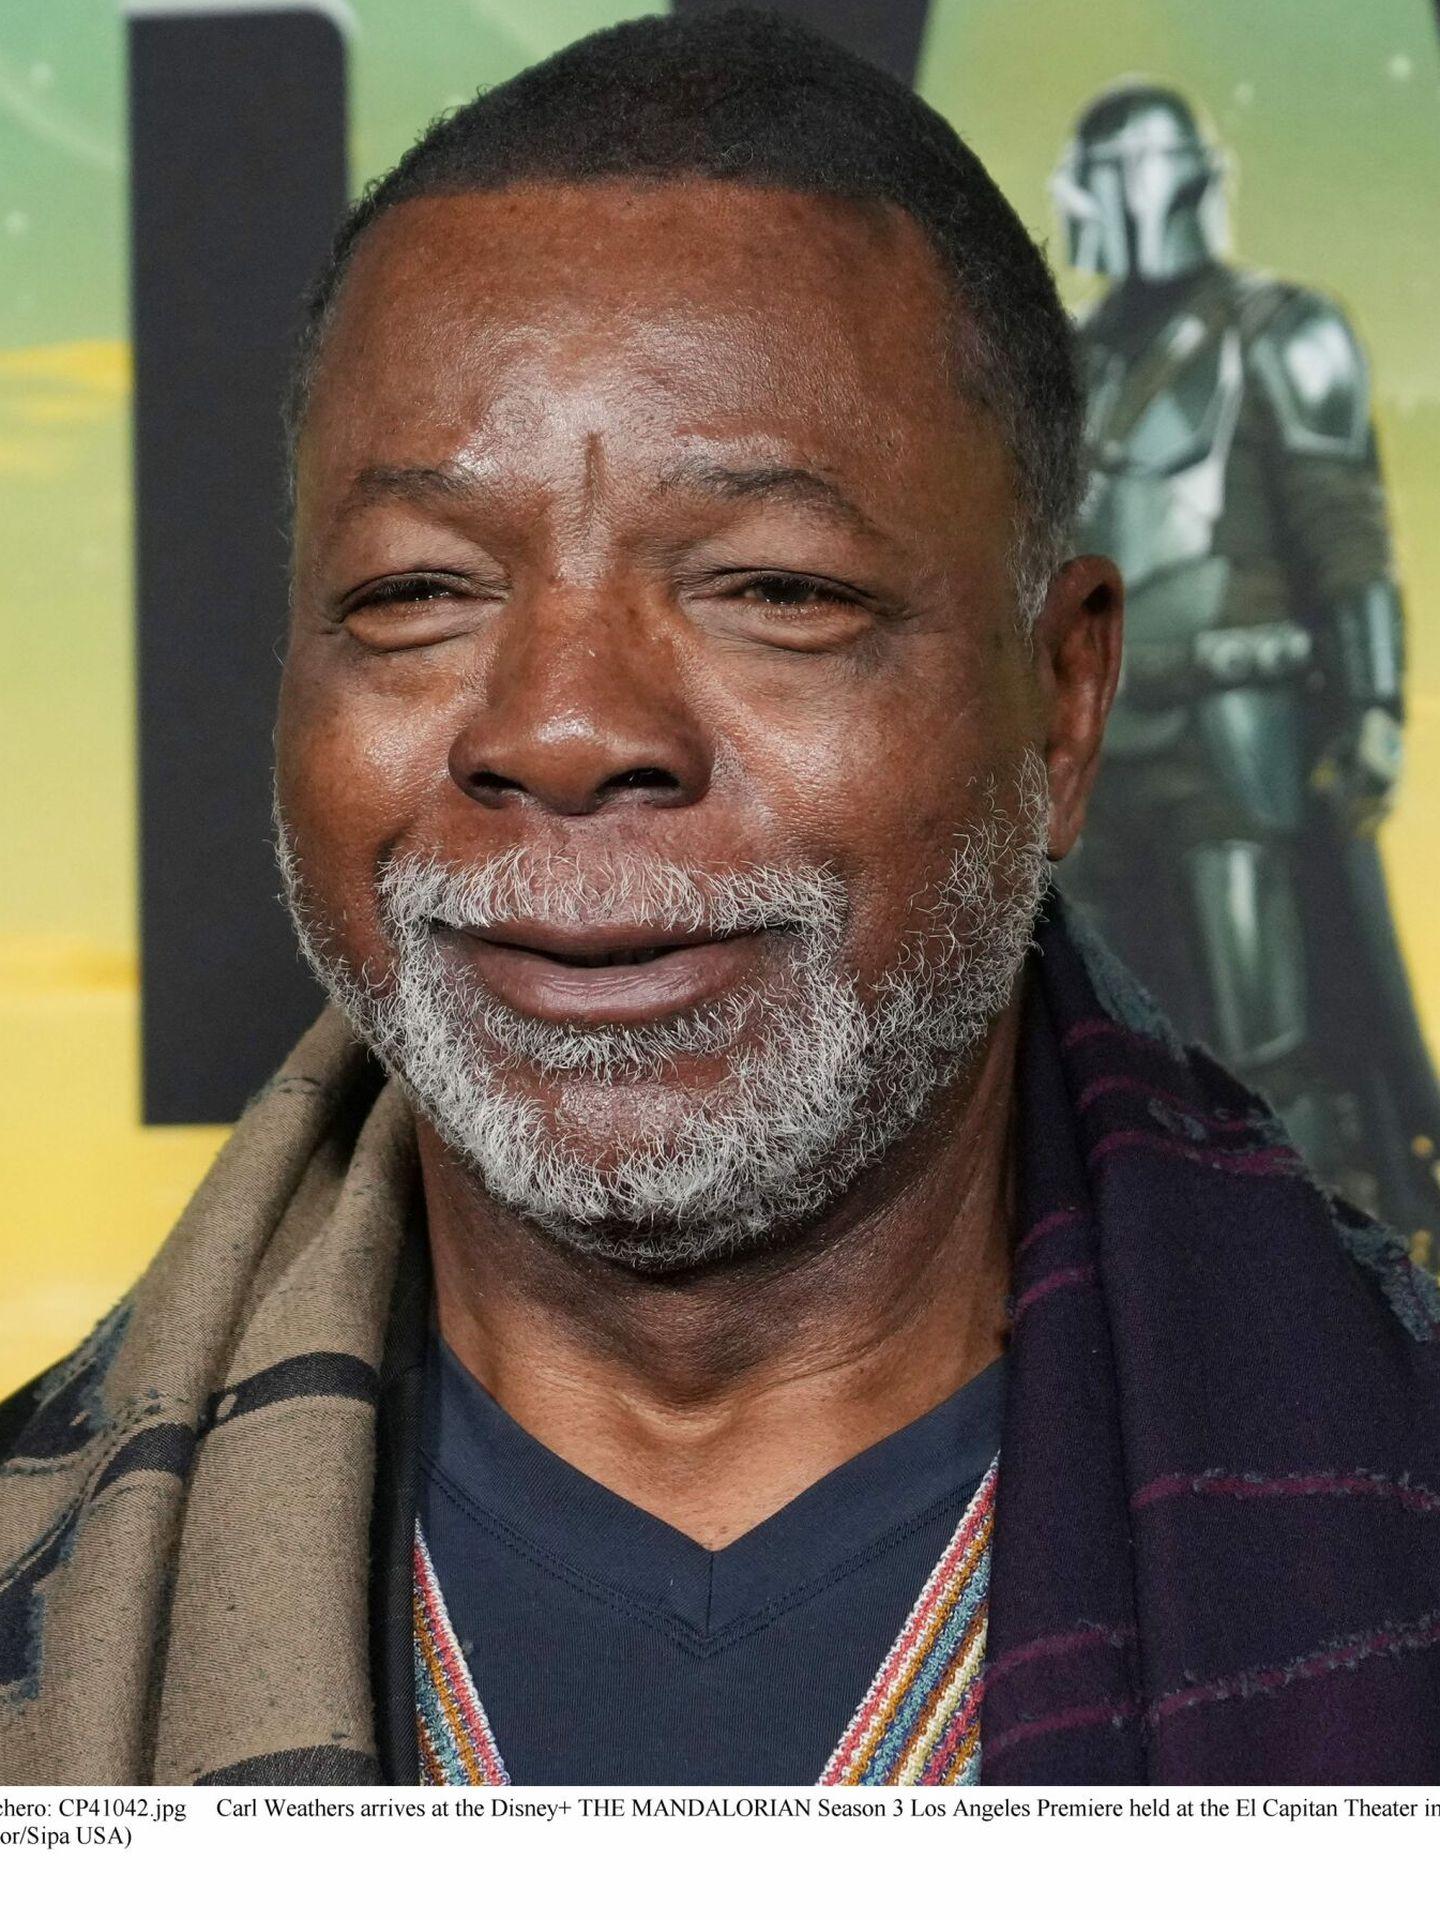 La reina Letizia, en un acto de Fundéu con un bolso Tissa Fontaneda, de Cristina Valls-Taberner. (Cordon Press)